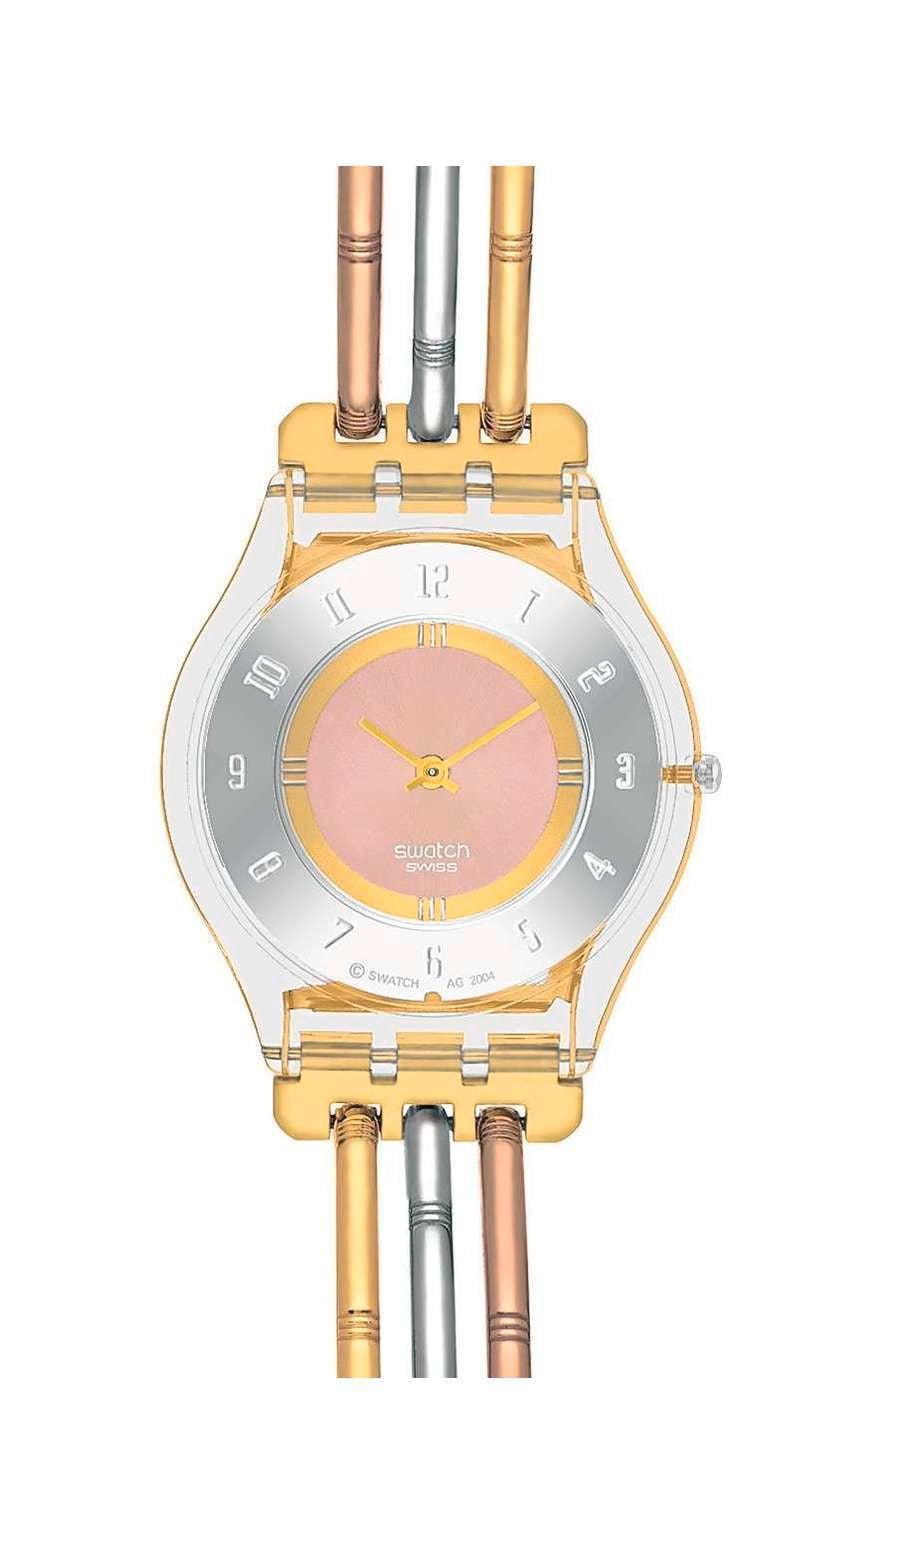 Swatch - TRI-GOLD - 1